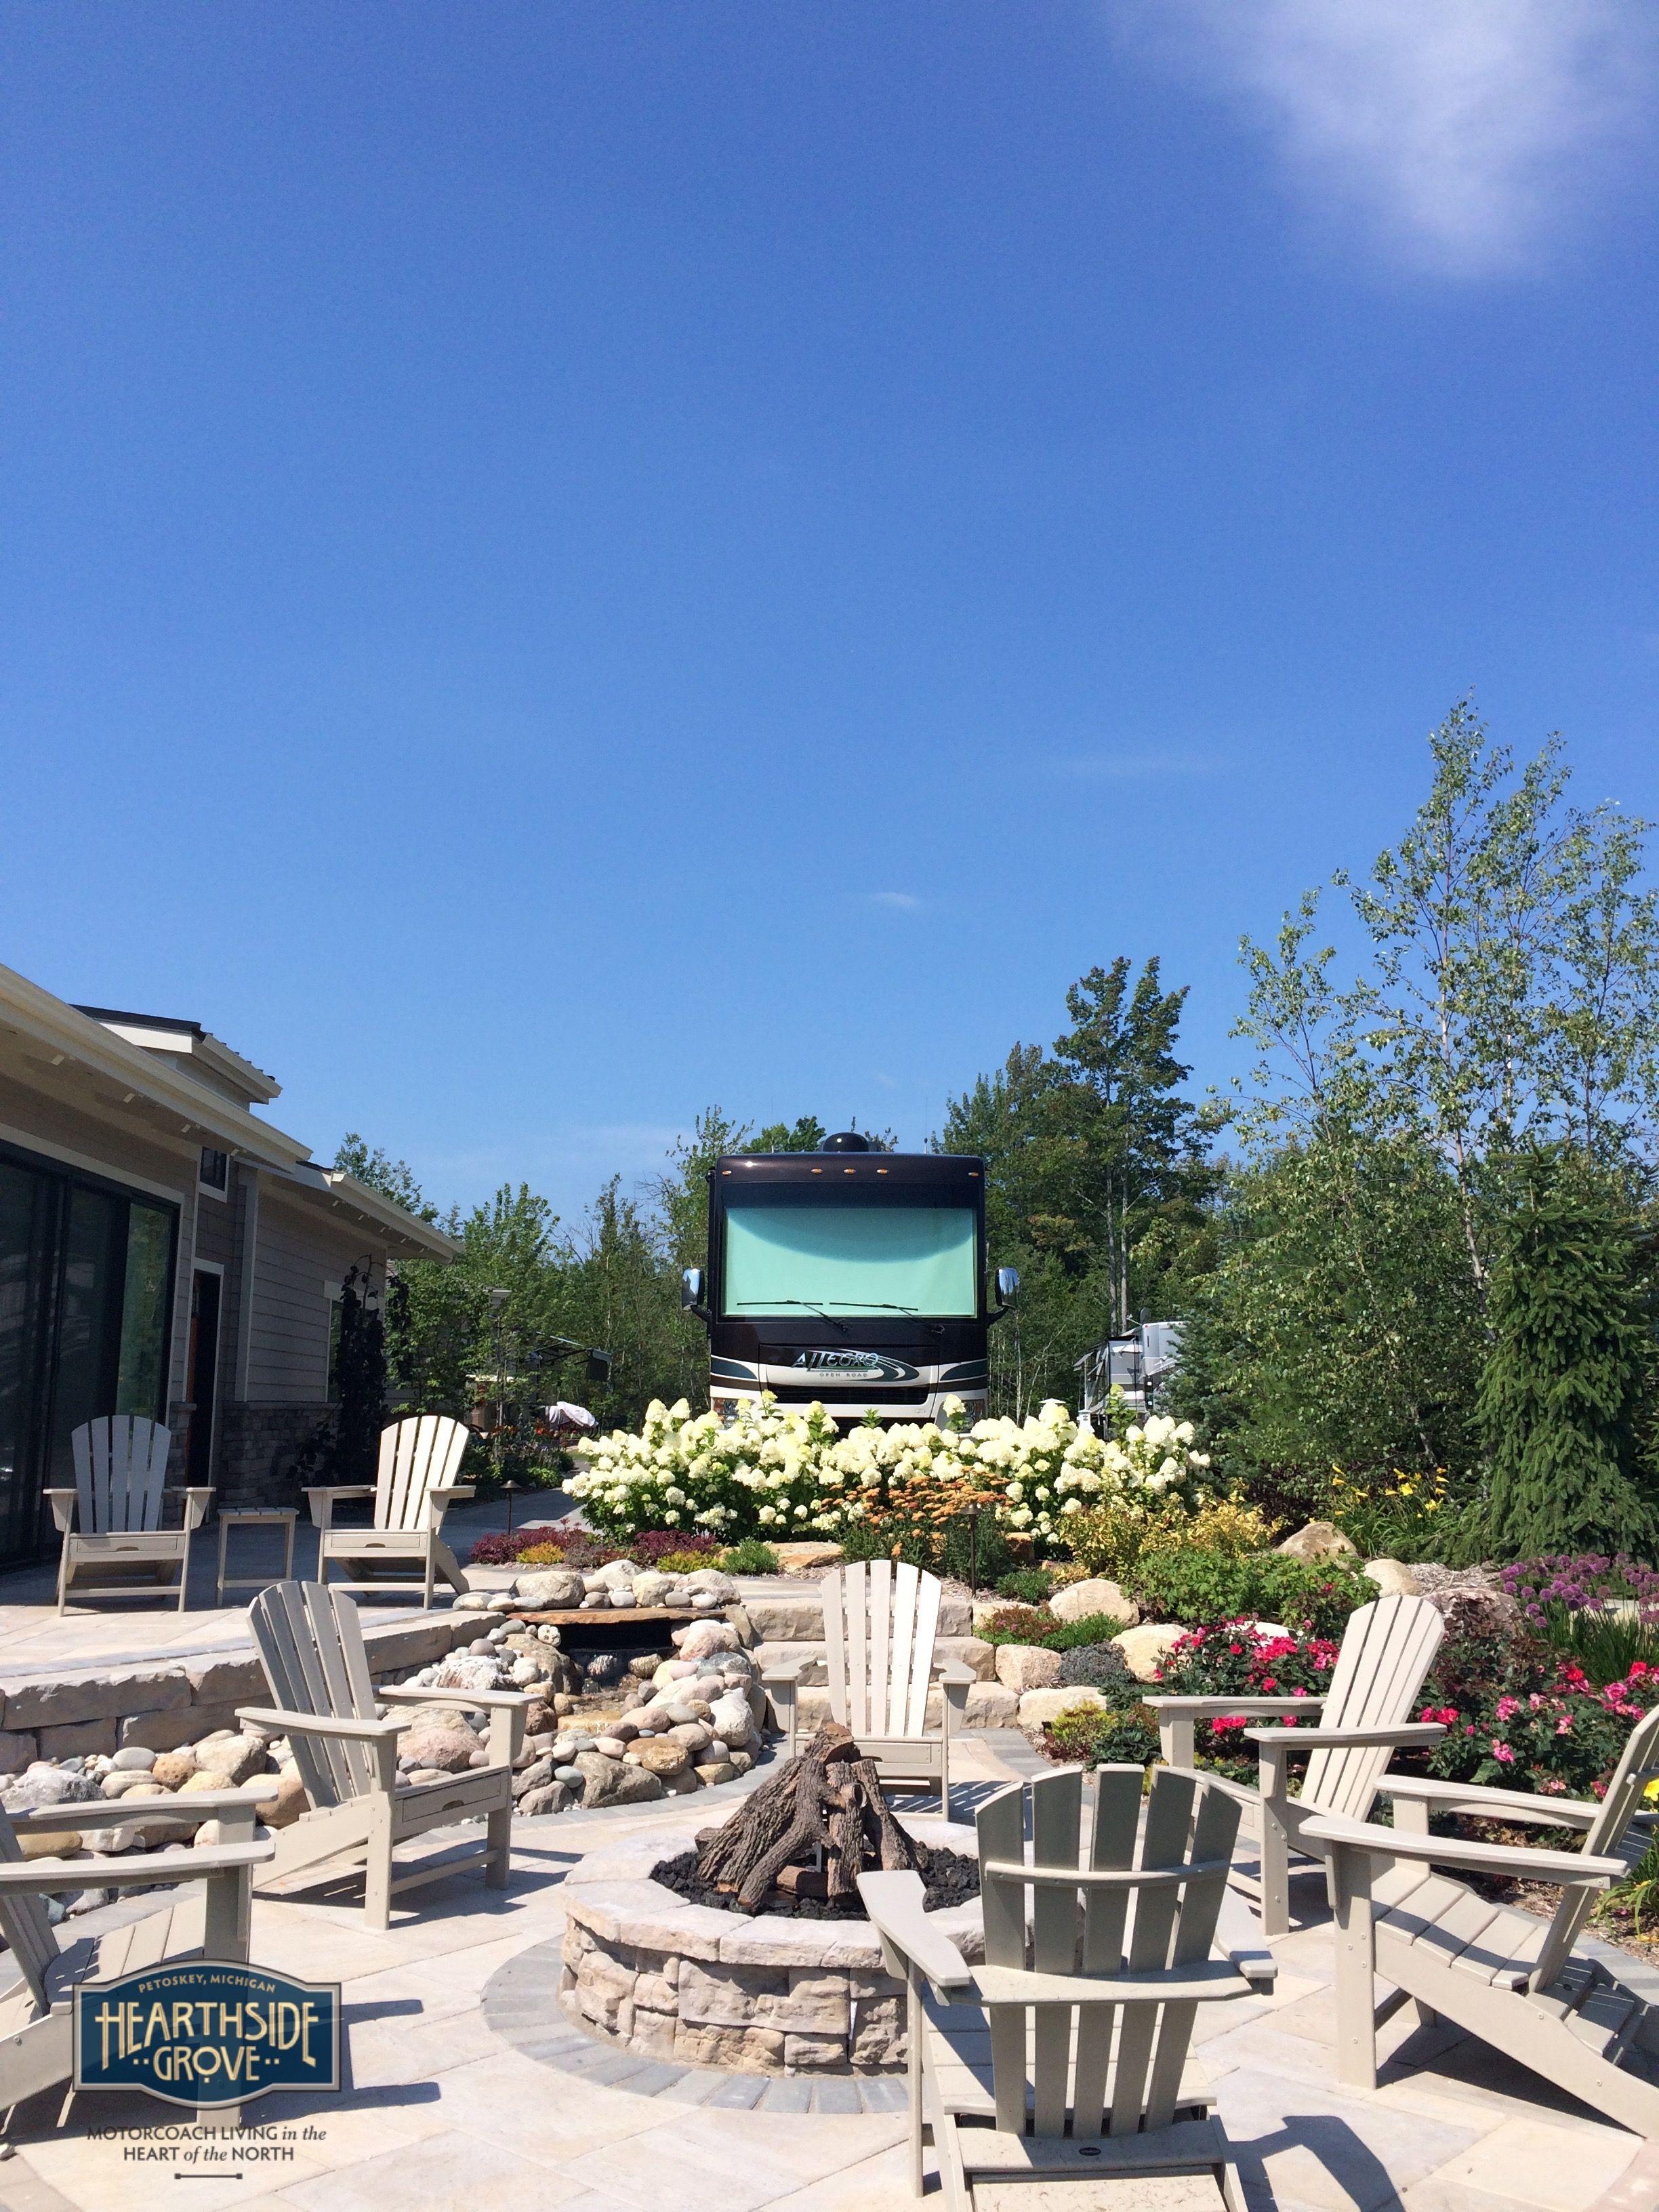 Hearthside Grove Luxury Motorcoach Resort Lot 159   #exterior #patio  #outdoor #firepit